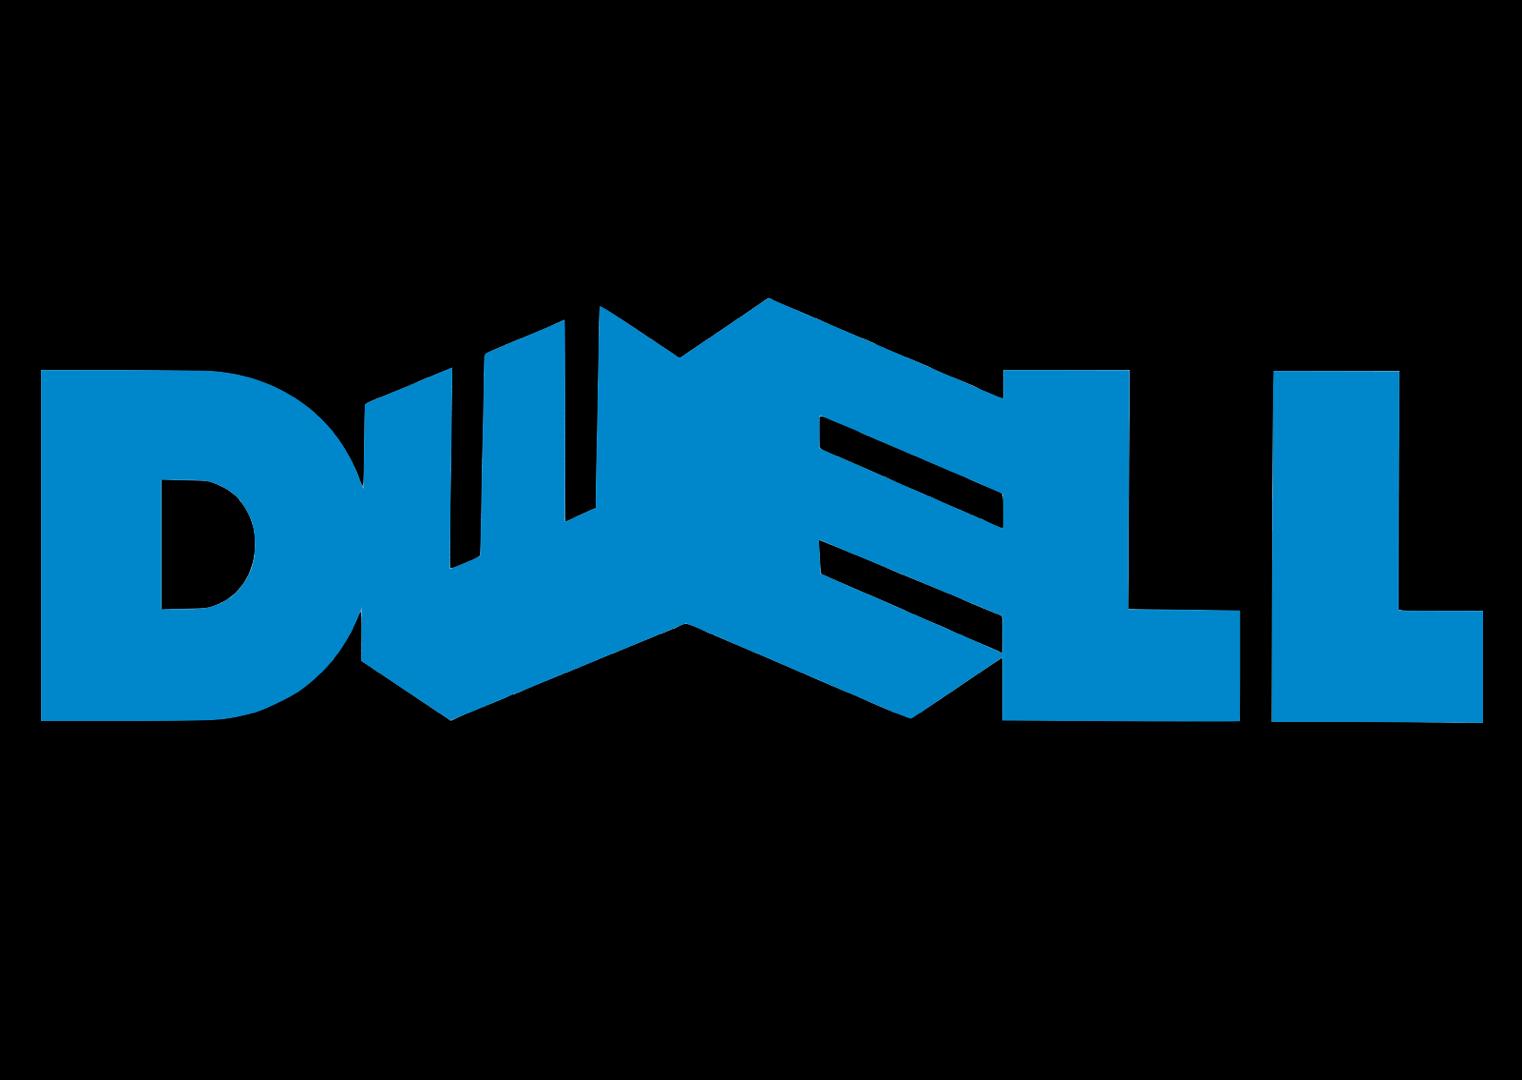 dwell_final.png